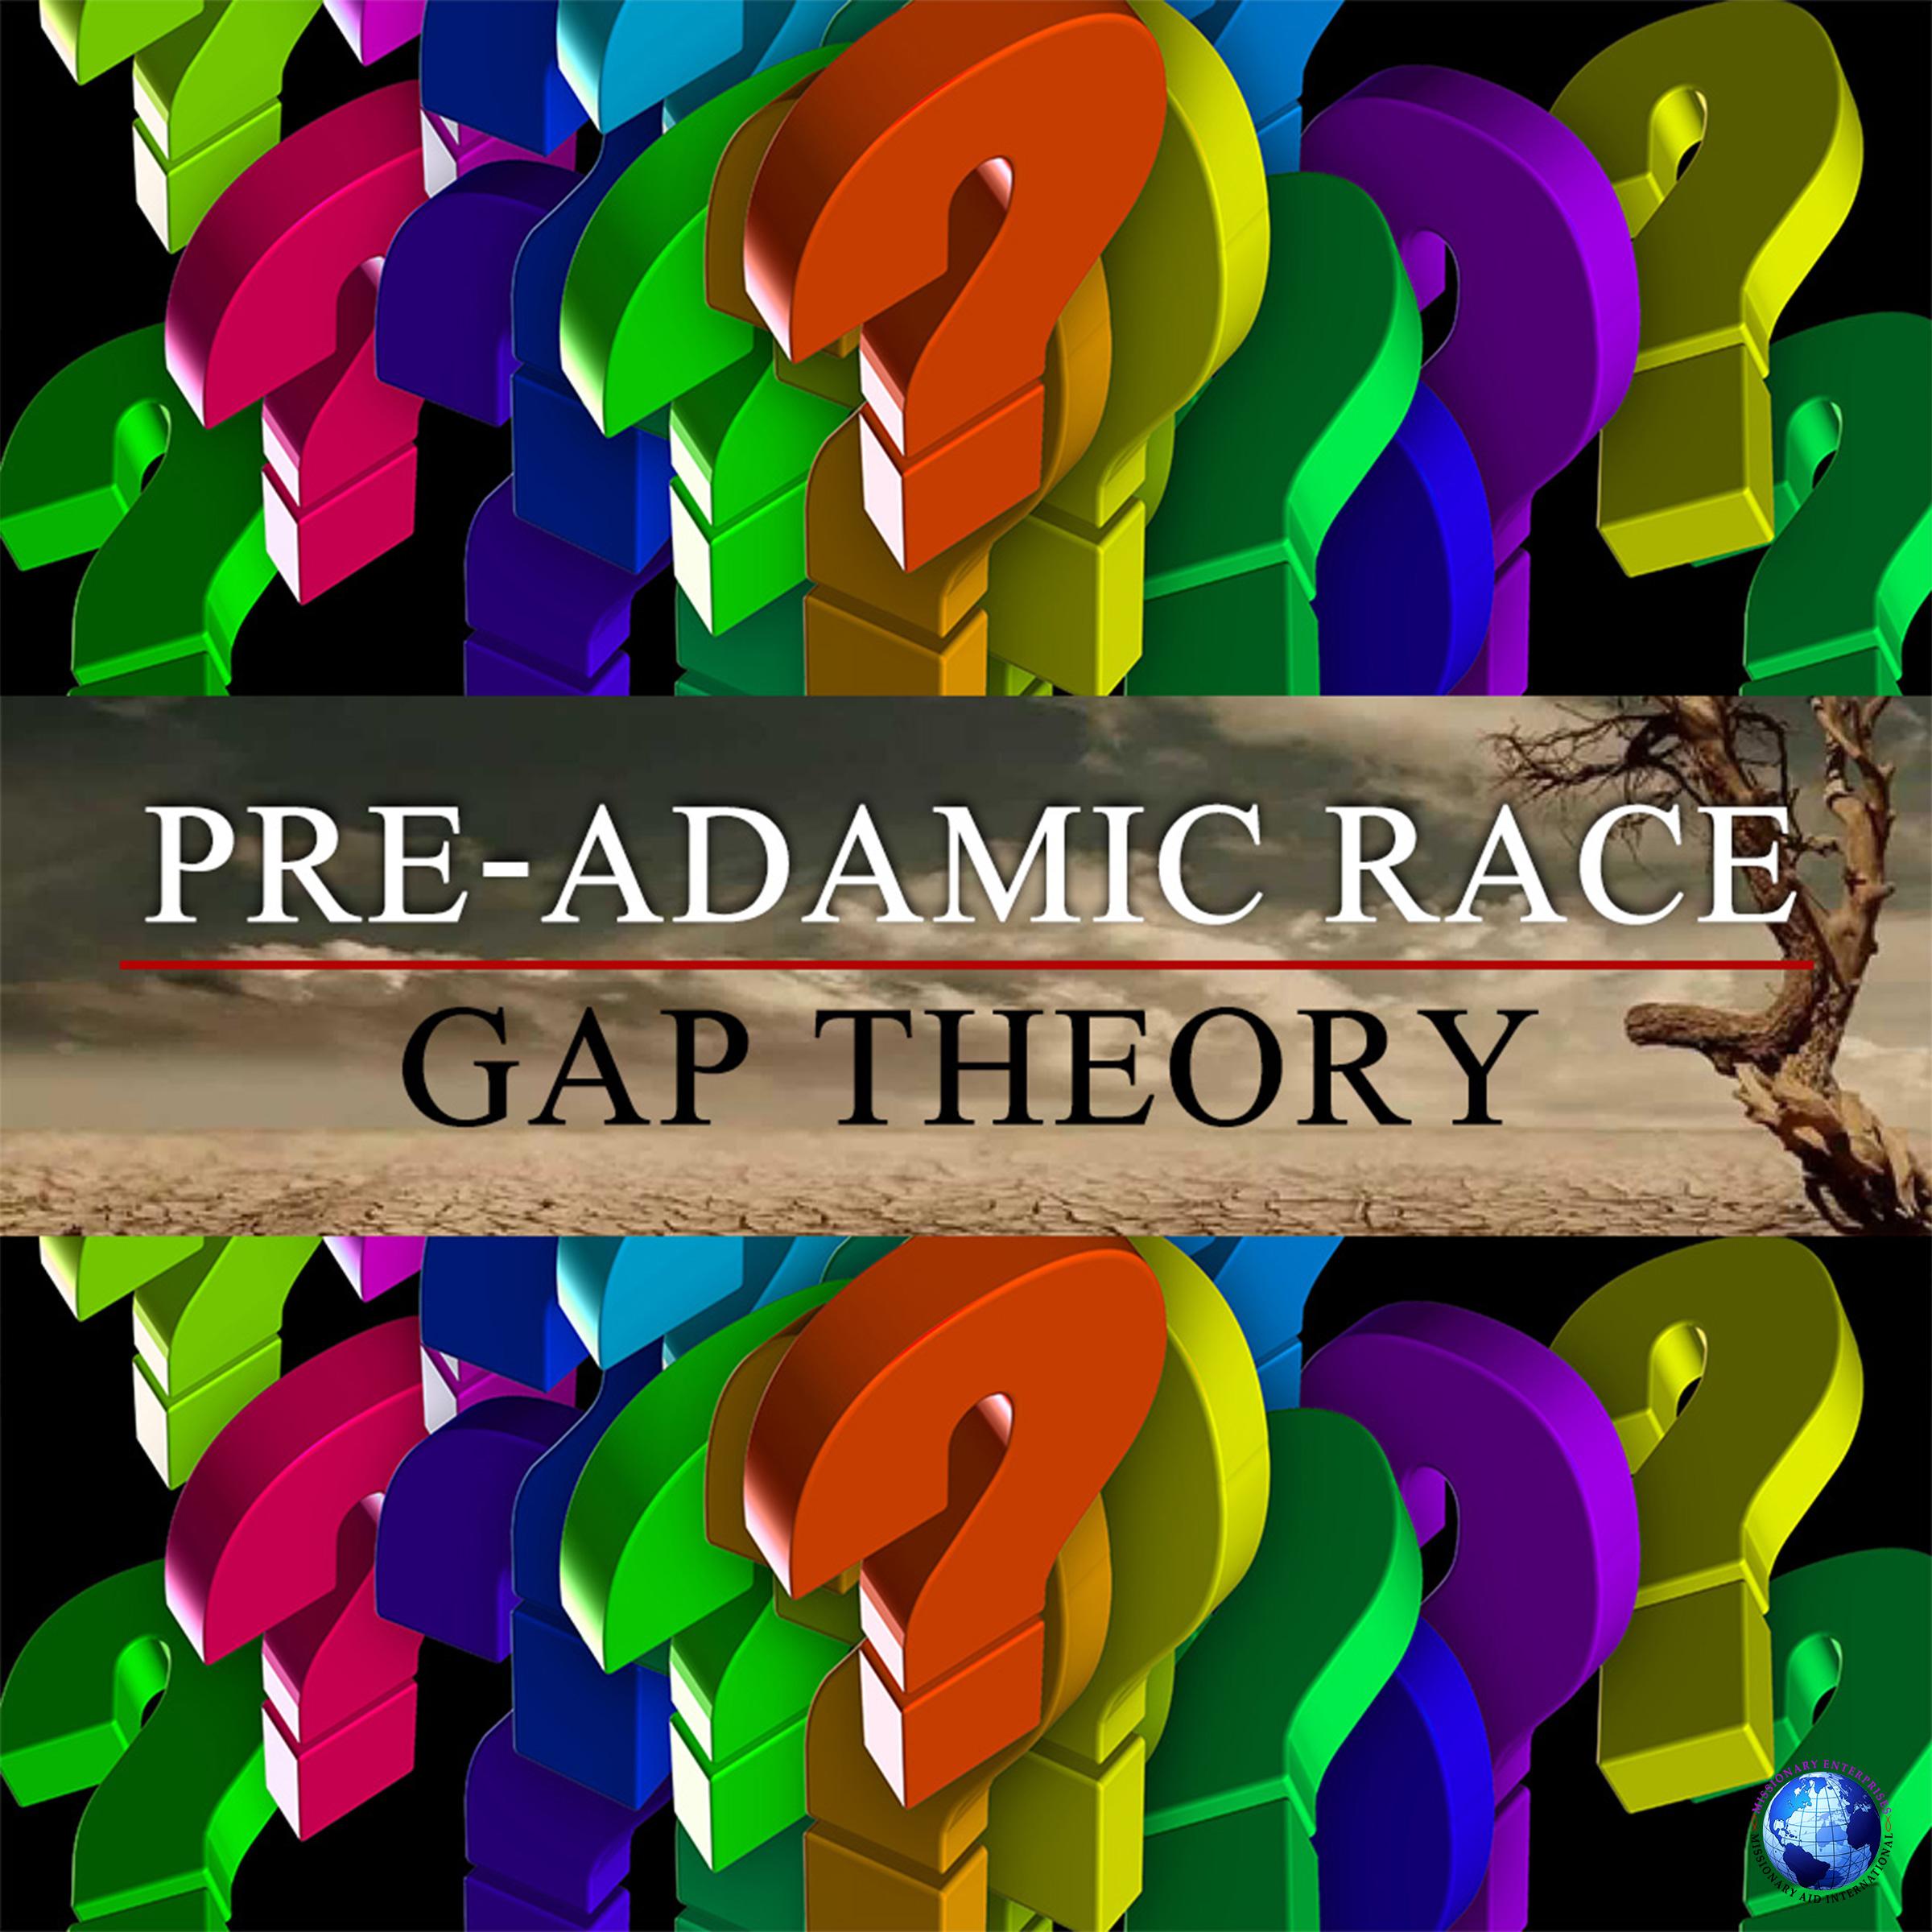 Pre-Adamic Race / Gap Theory